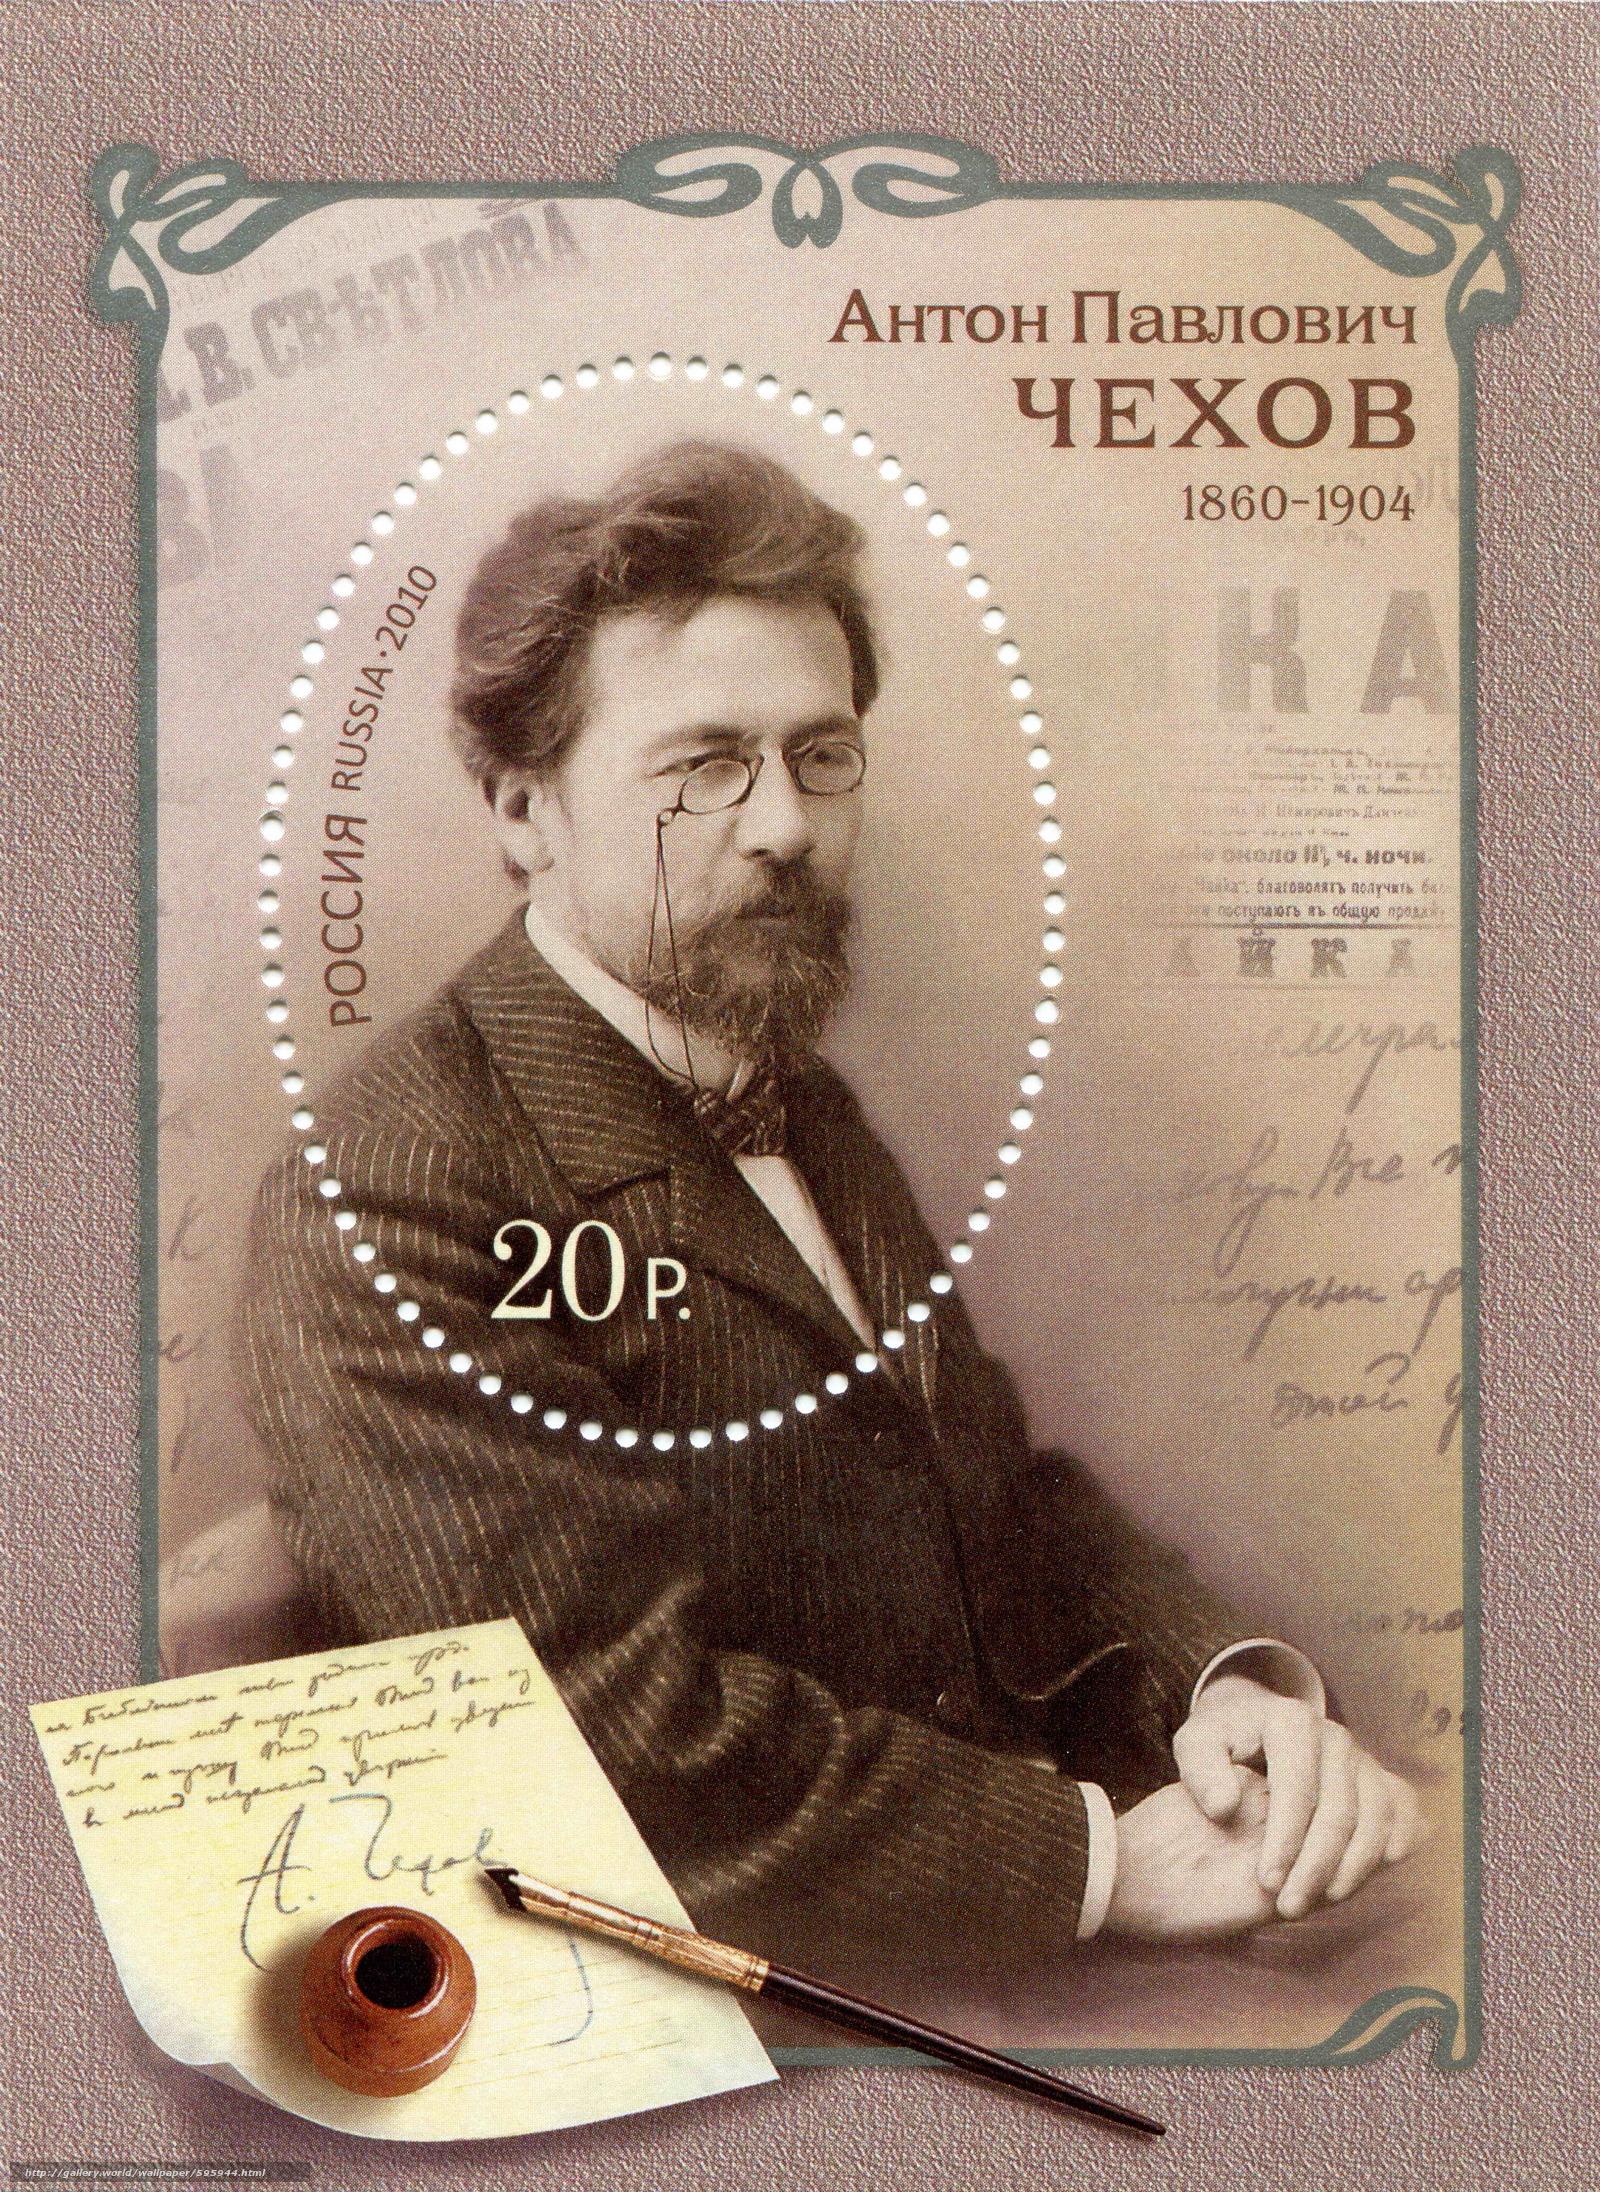 Download wallpaper Art,  Russia,  stamp,  Anton Pavlovich Chekhov 1860-1914 free desktop wallpaper in the resolution 3442x4715 — picture №595944